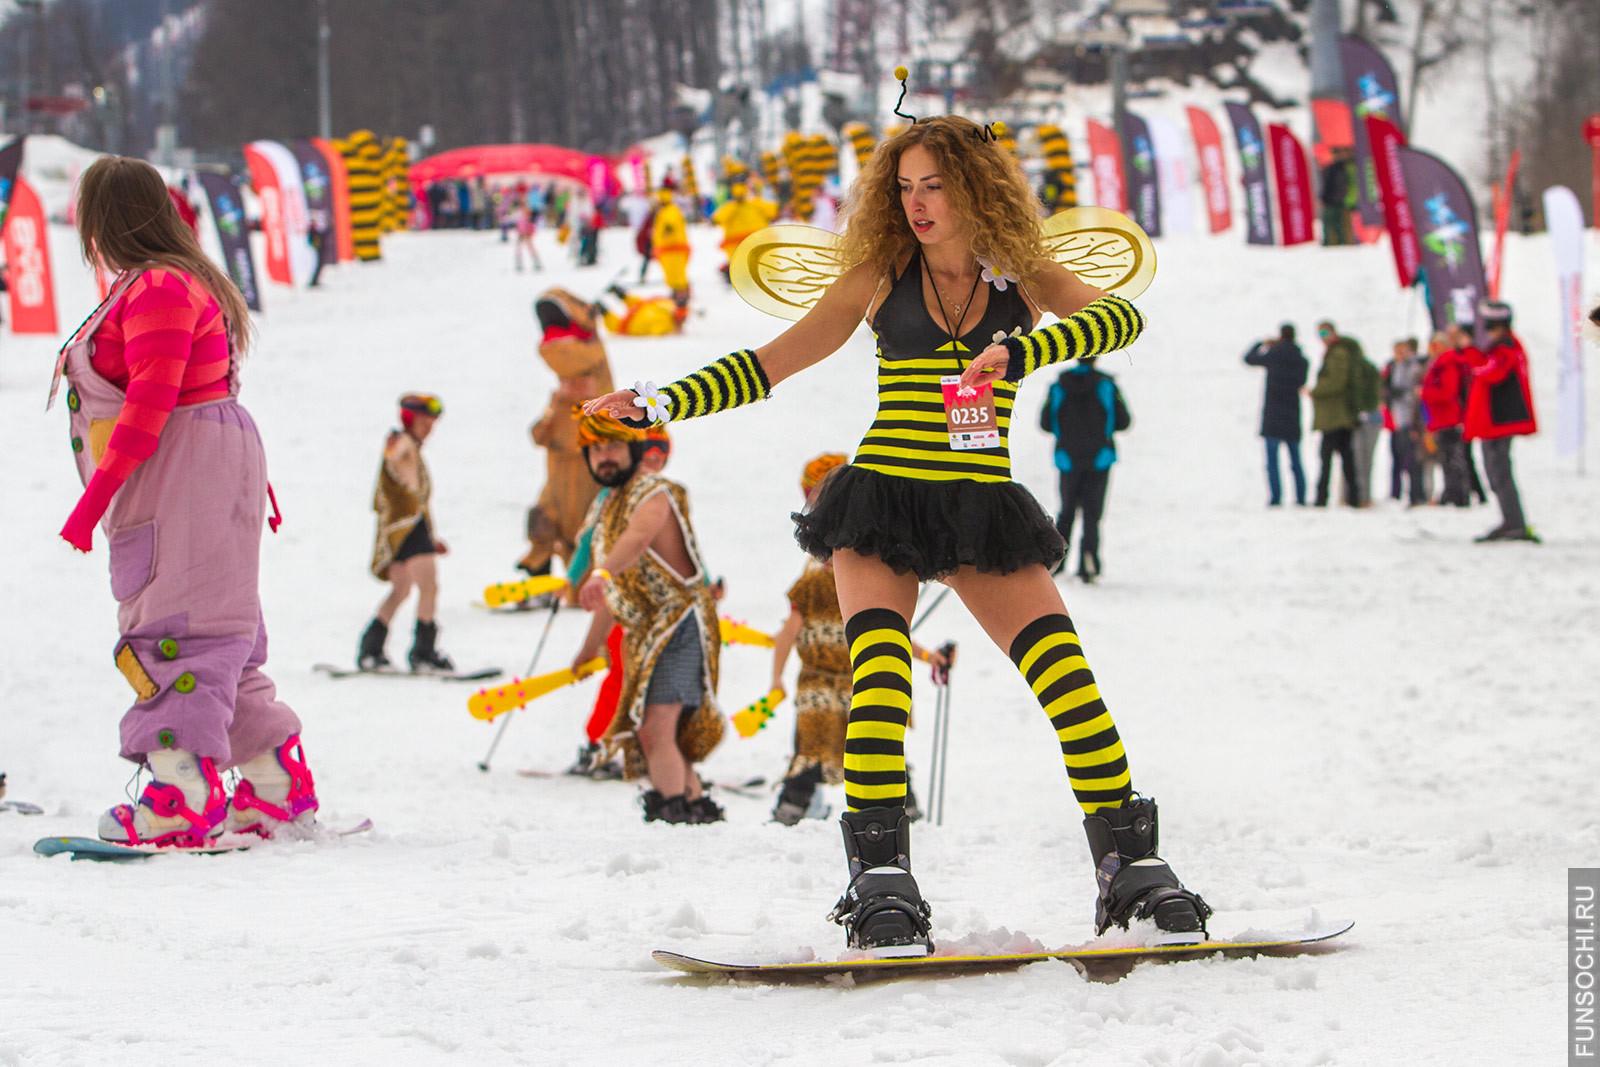 Сноубордистка в костюме пчелы